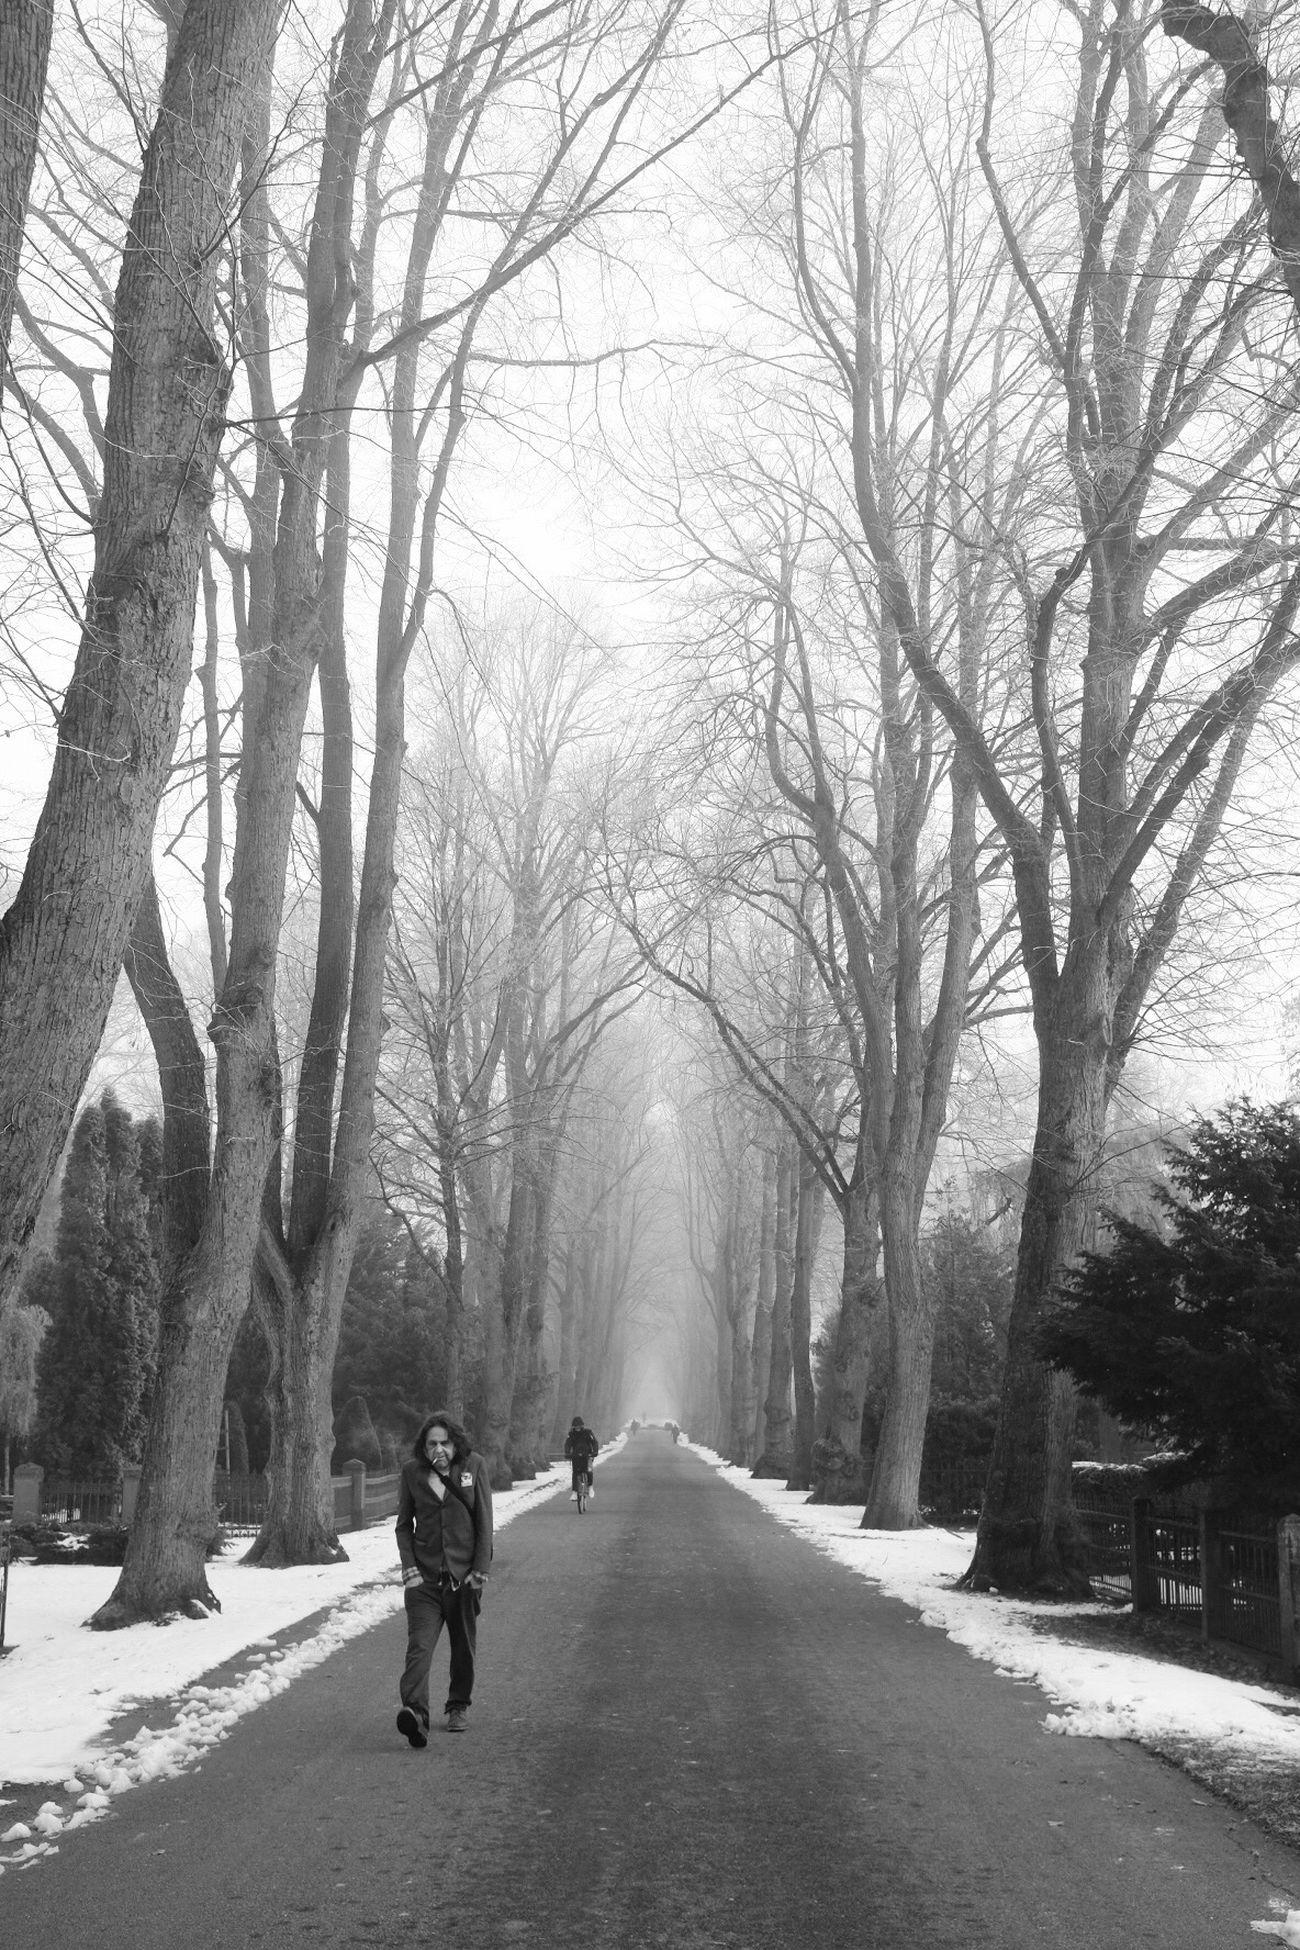 Winter Street Photography EyeEm Best Shots - Black + White Monochrome Bw_collection Shootermag